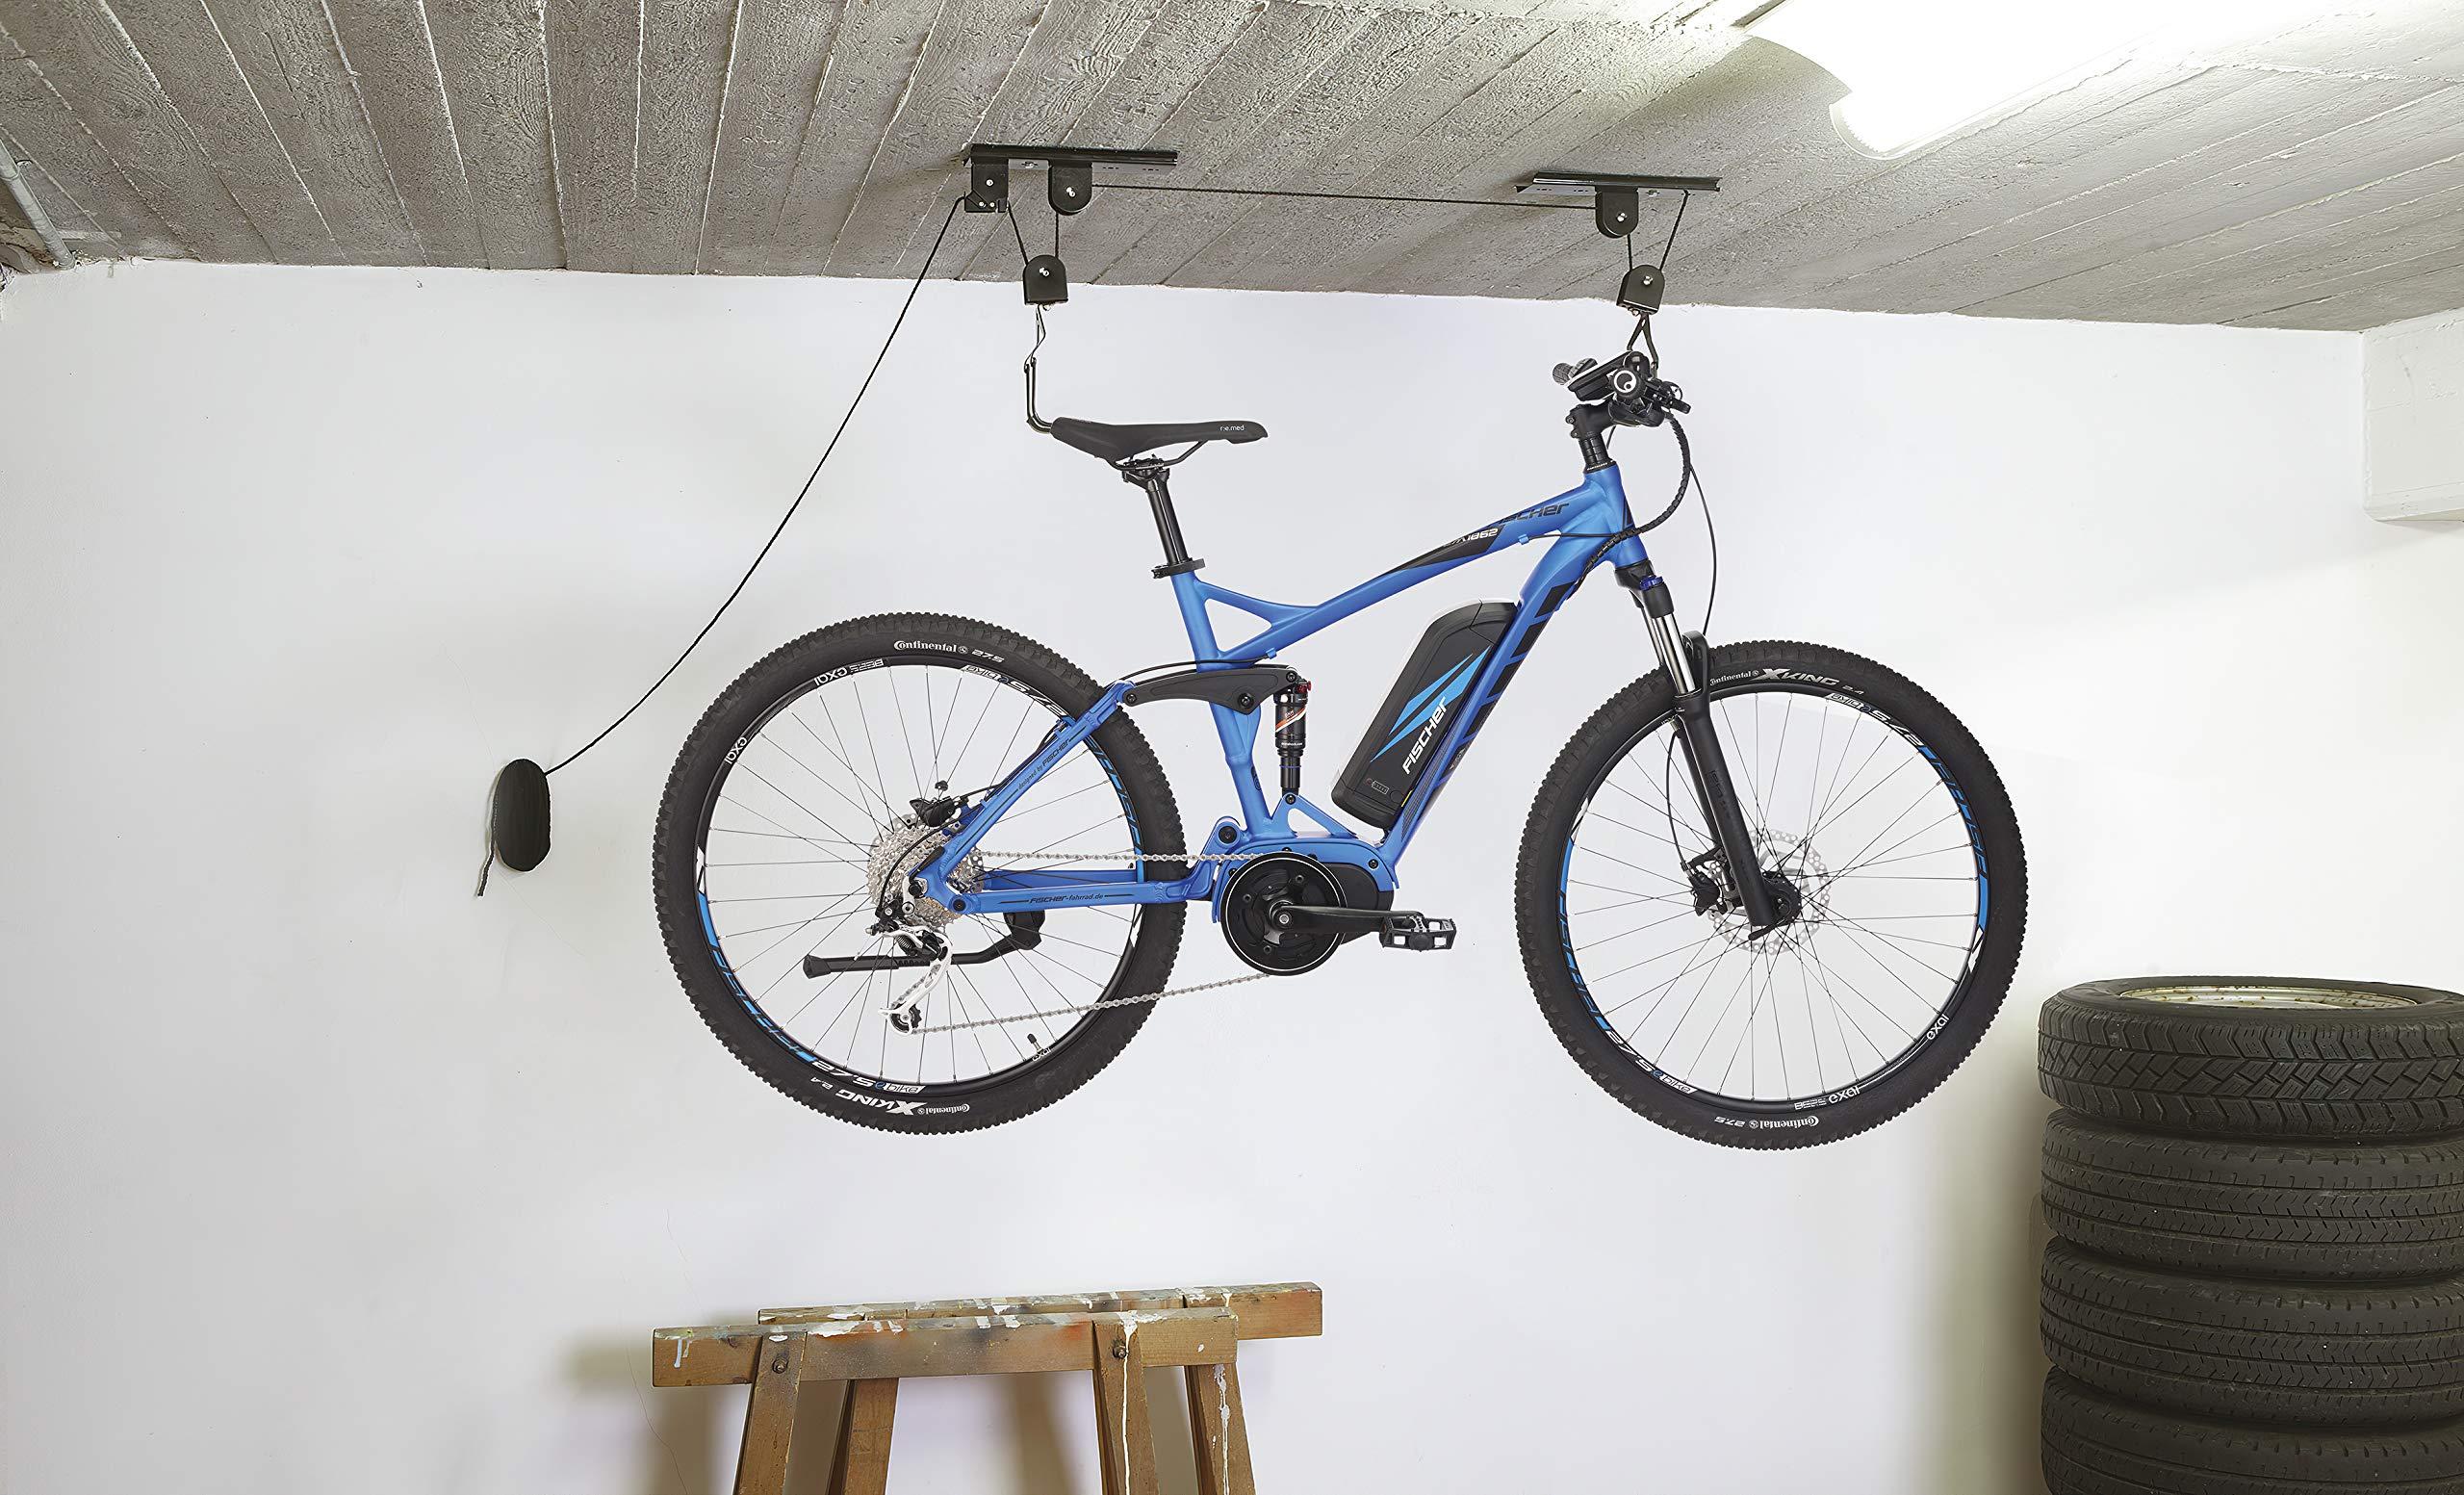 Fischer ProfiPlus Soporte para bicicleta, Unisex adulto, Soporte para bicicleta., 50386, Negro , 30 kg: Amazon.es: Deportes y aire libre